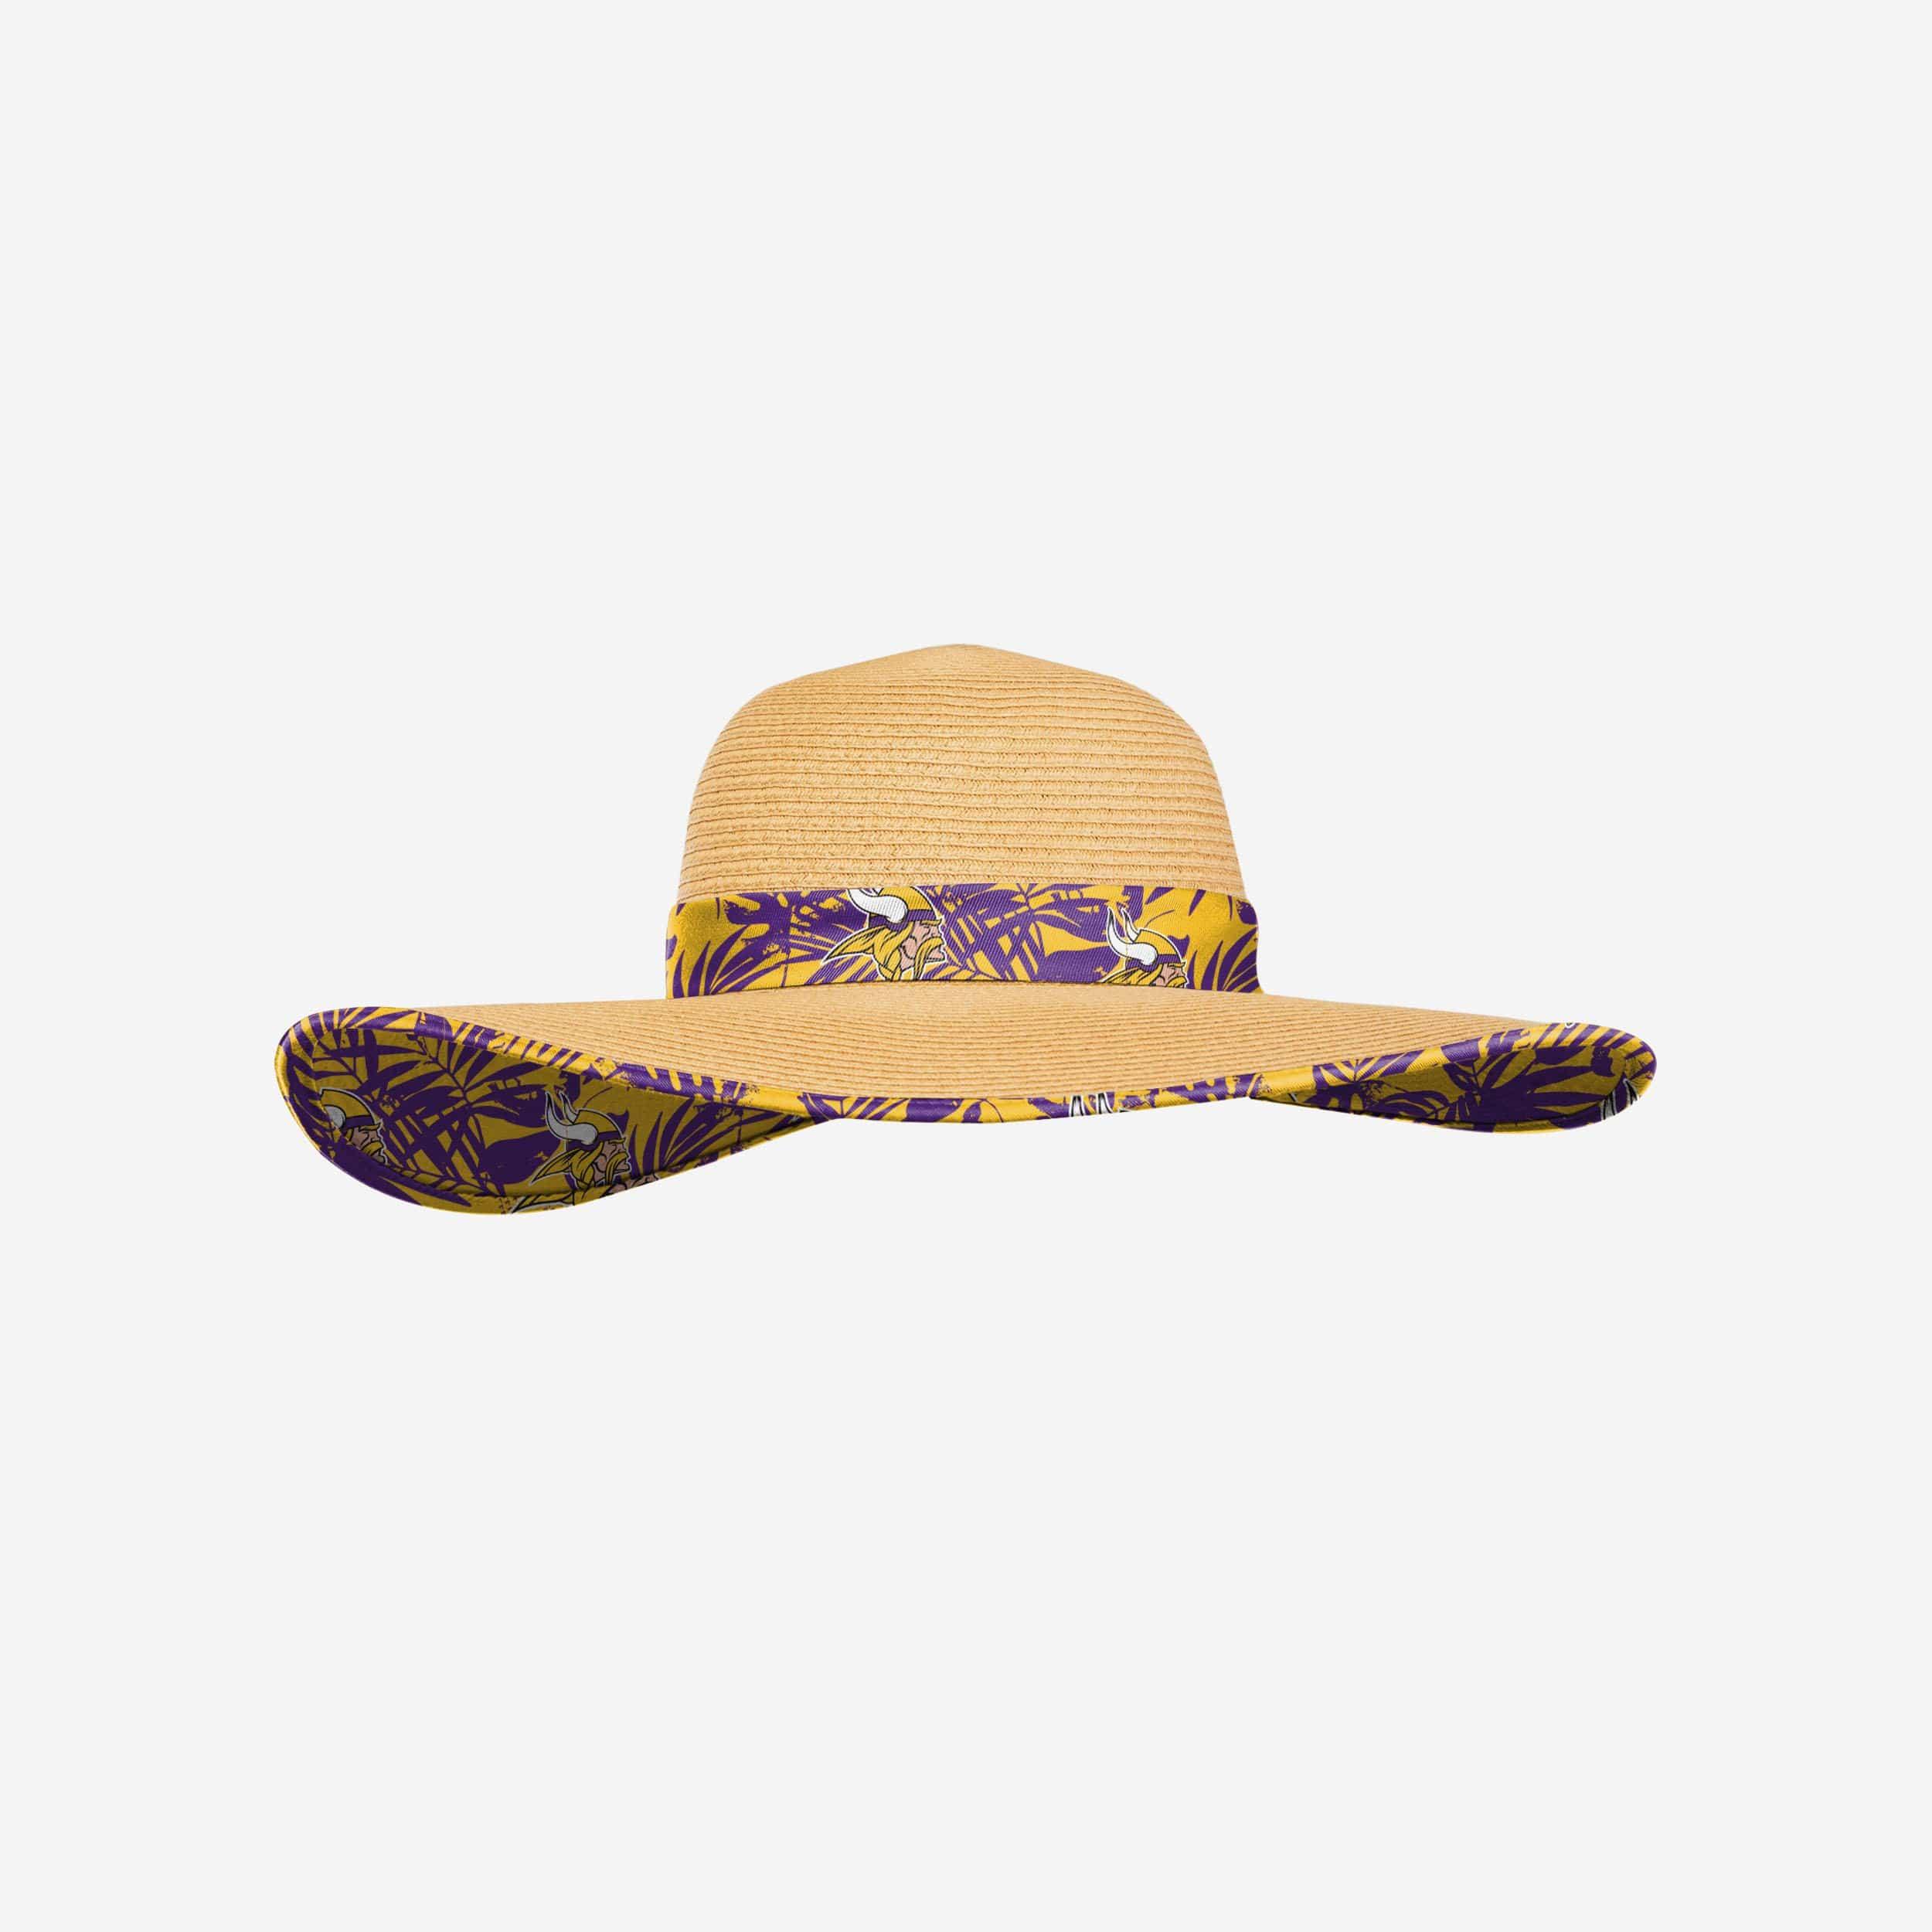 FOCO Minnesota Vikings Womens Floral Straw Hat